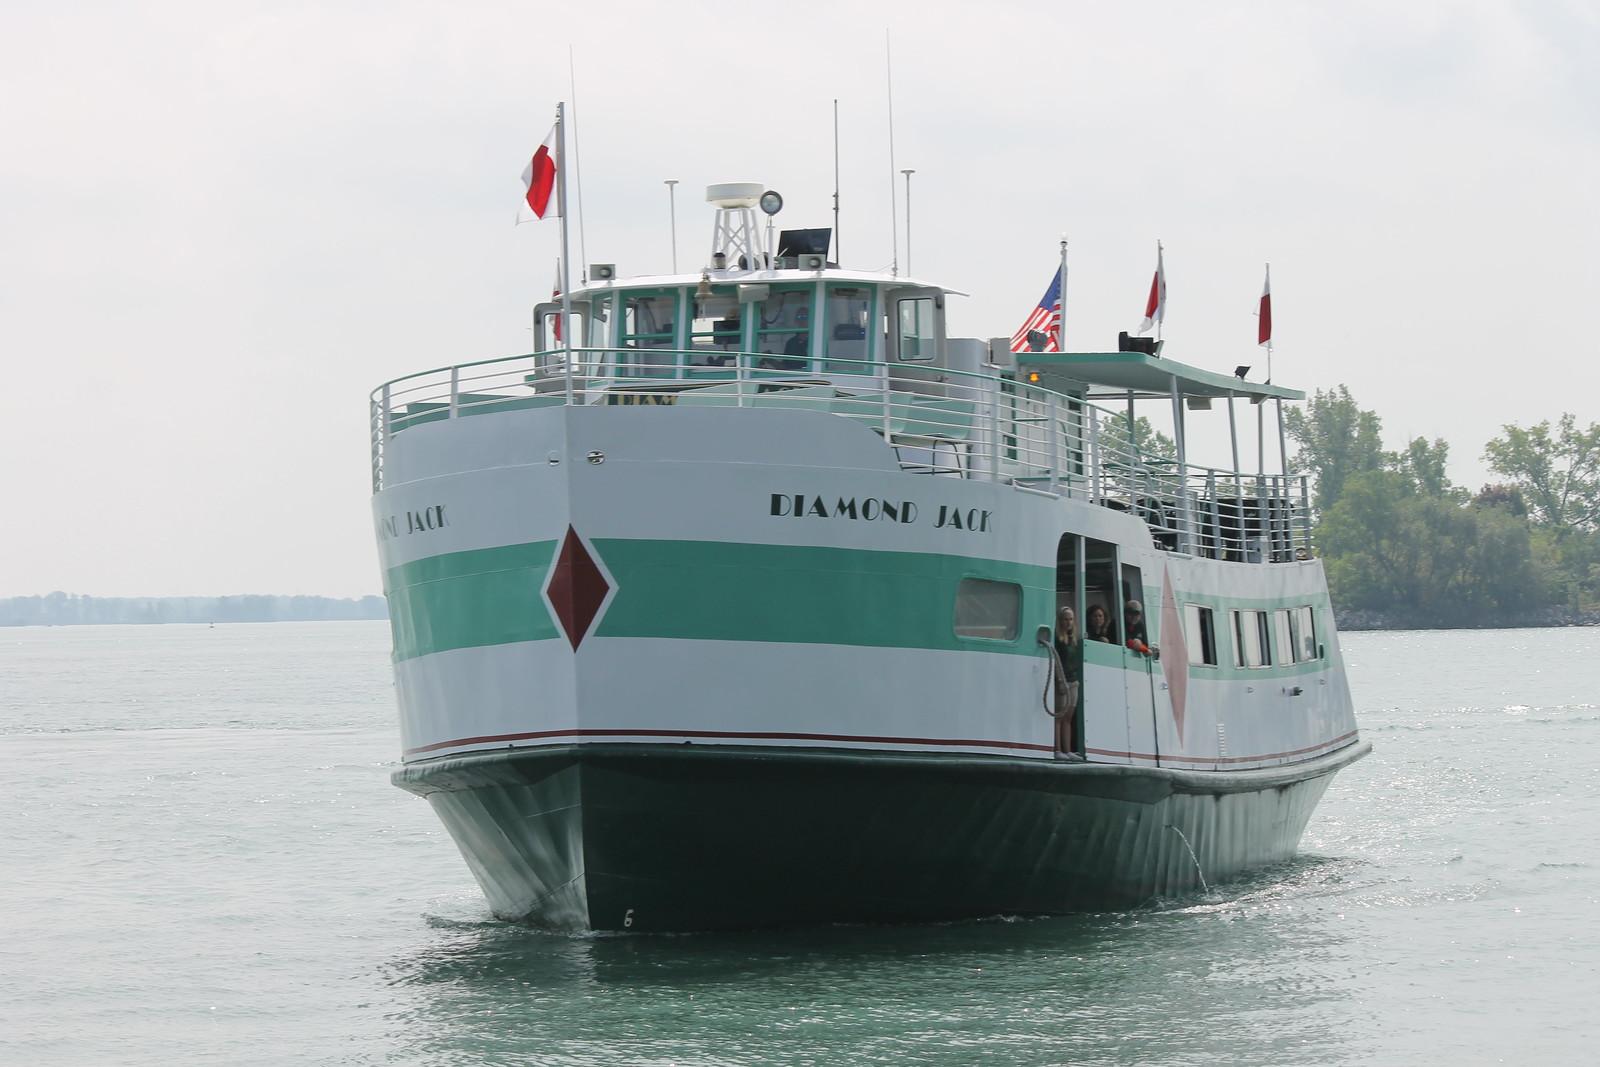 Diamond Jack (Tour Boat) - August 31, 2014